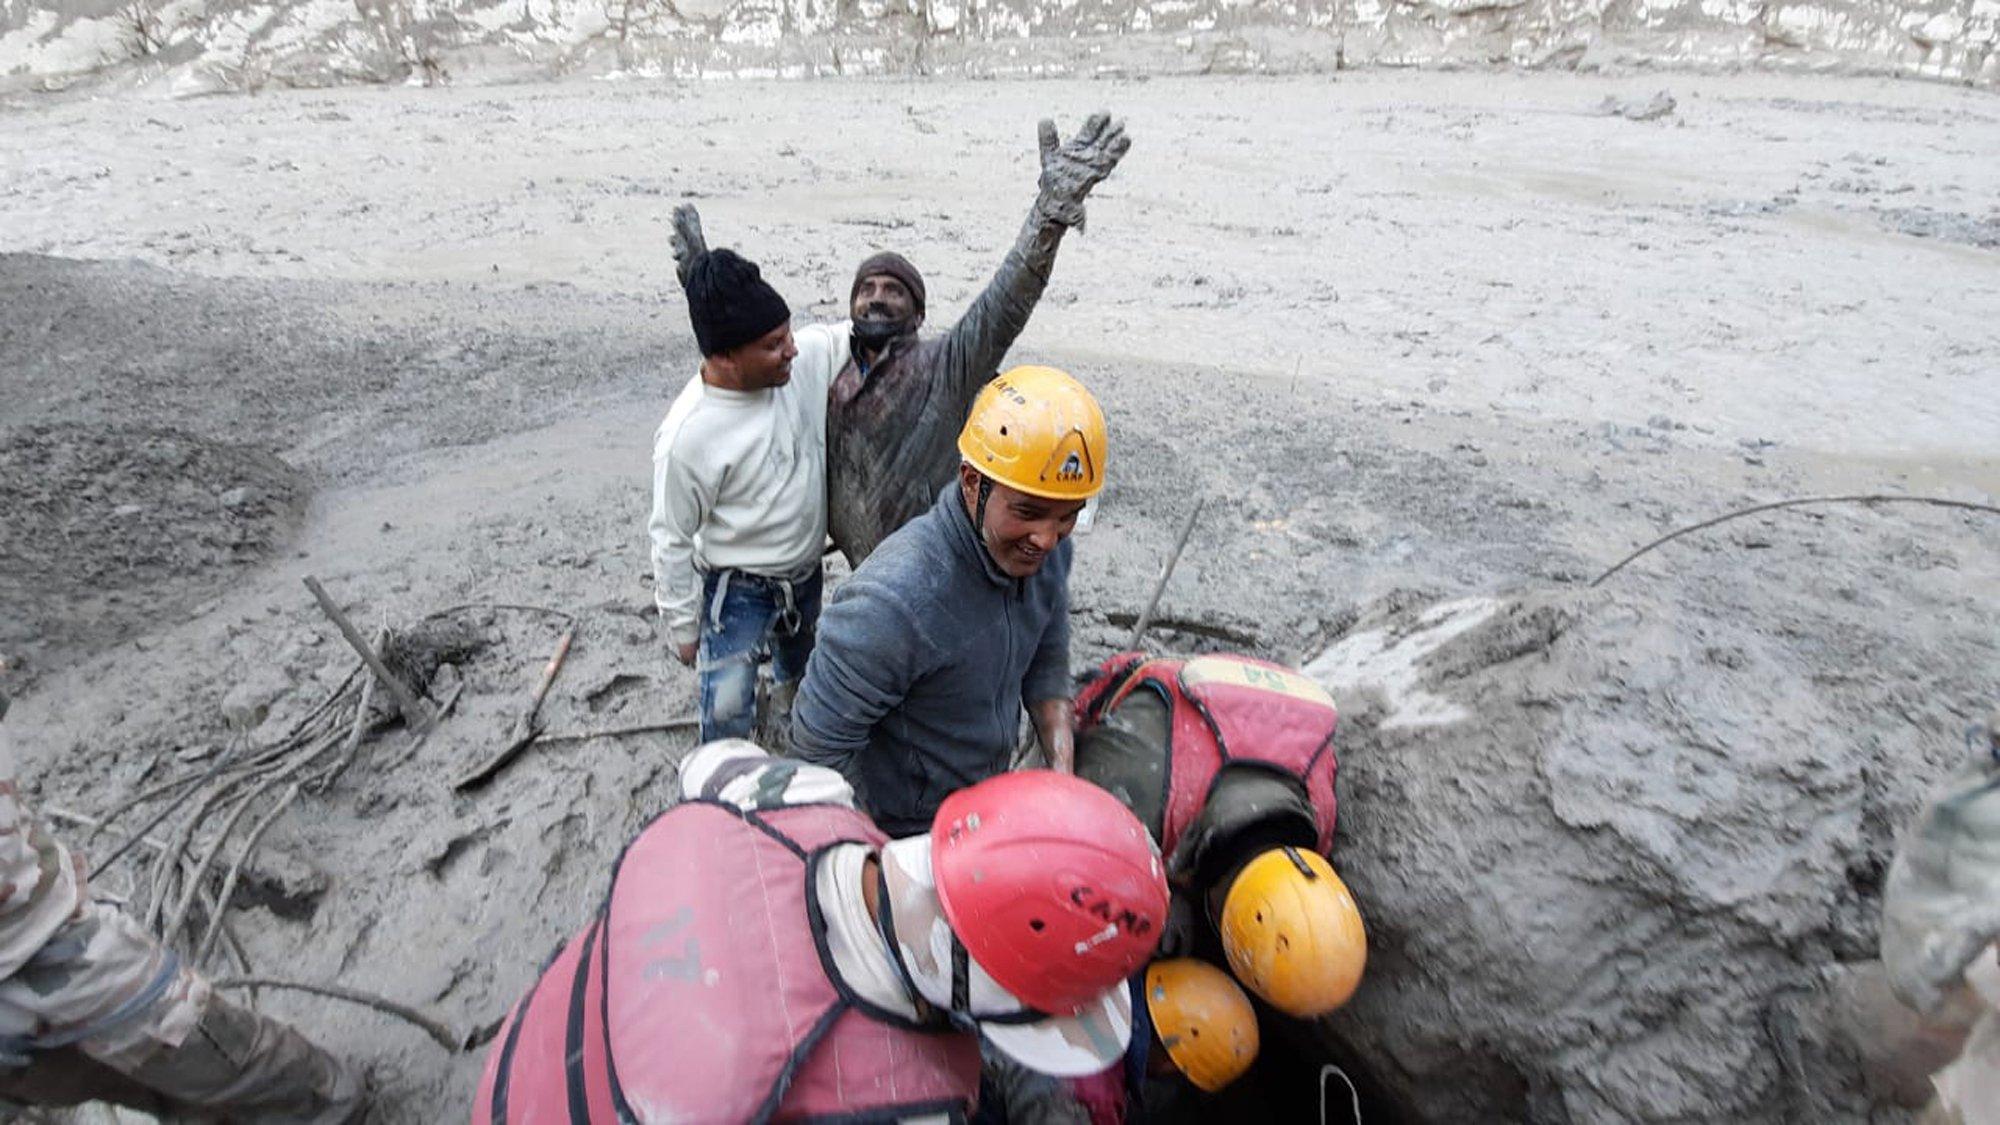 Tapovan-Glacier-Flood-Climate-Change-Himalayas-FF.jpg